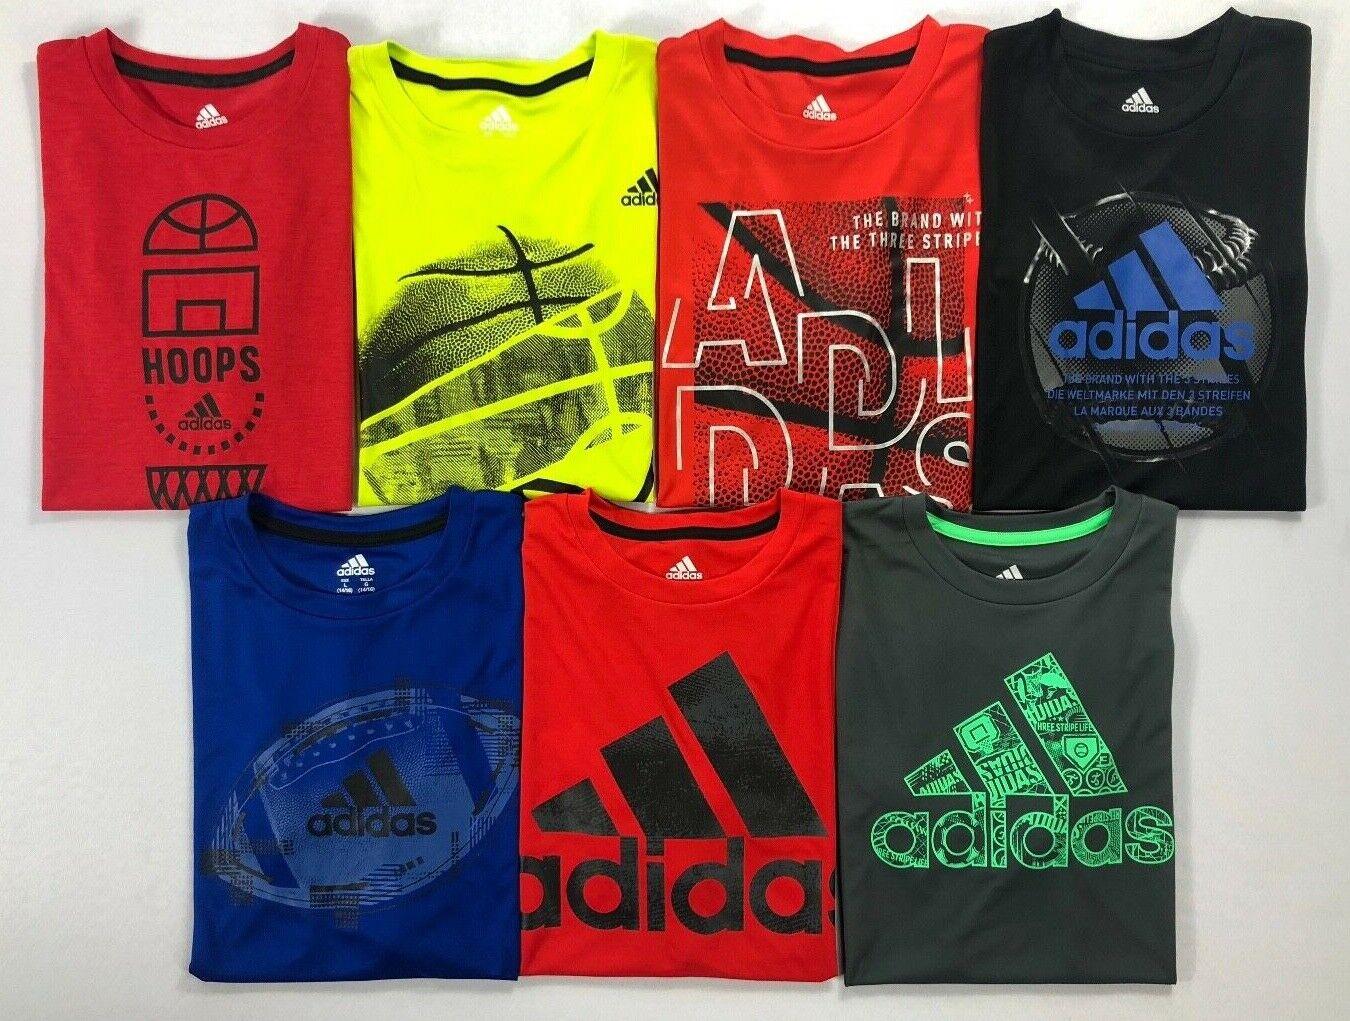 Boy's Youth Adidas Climalite Polyester Short Sleeve Shirt